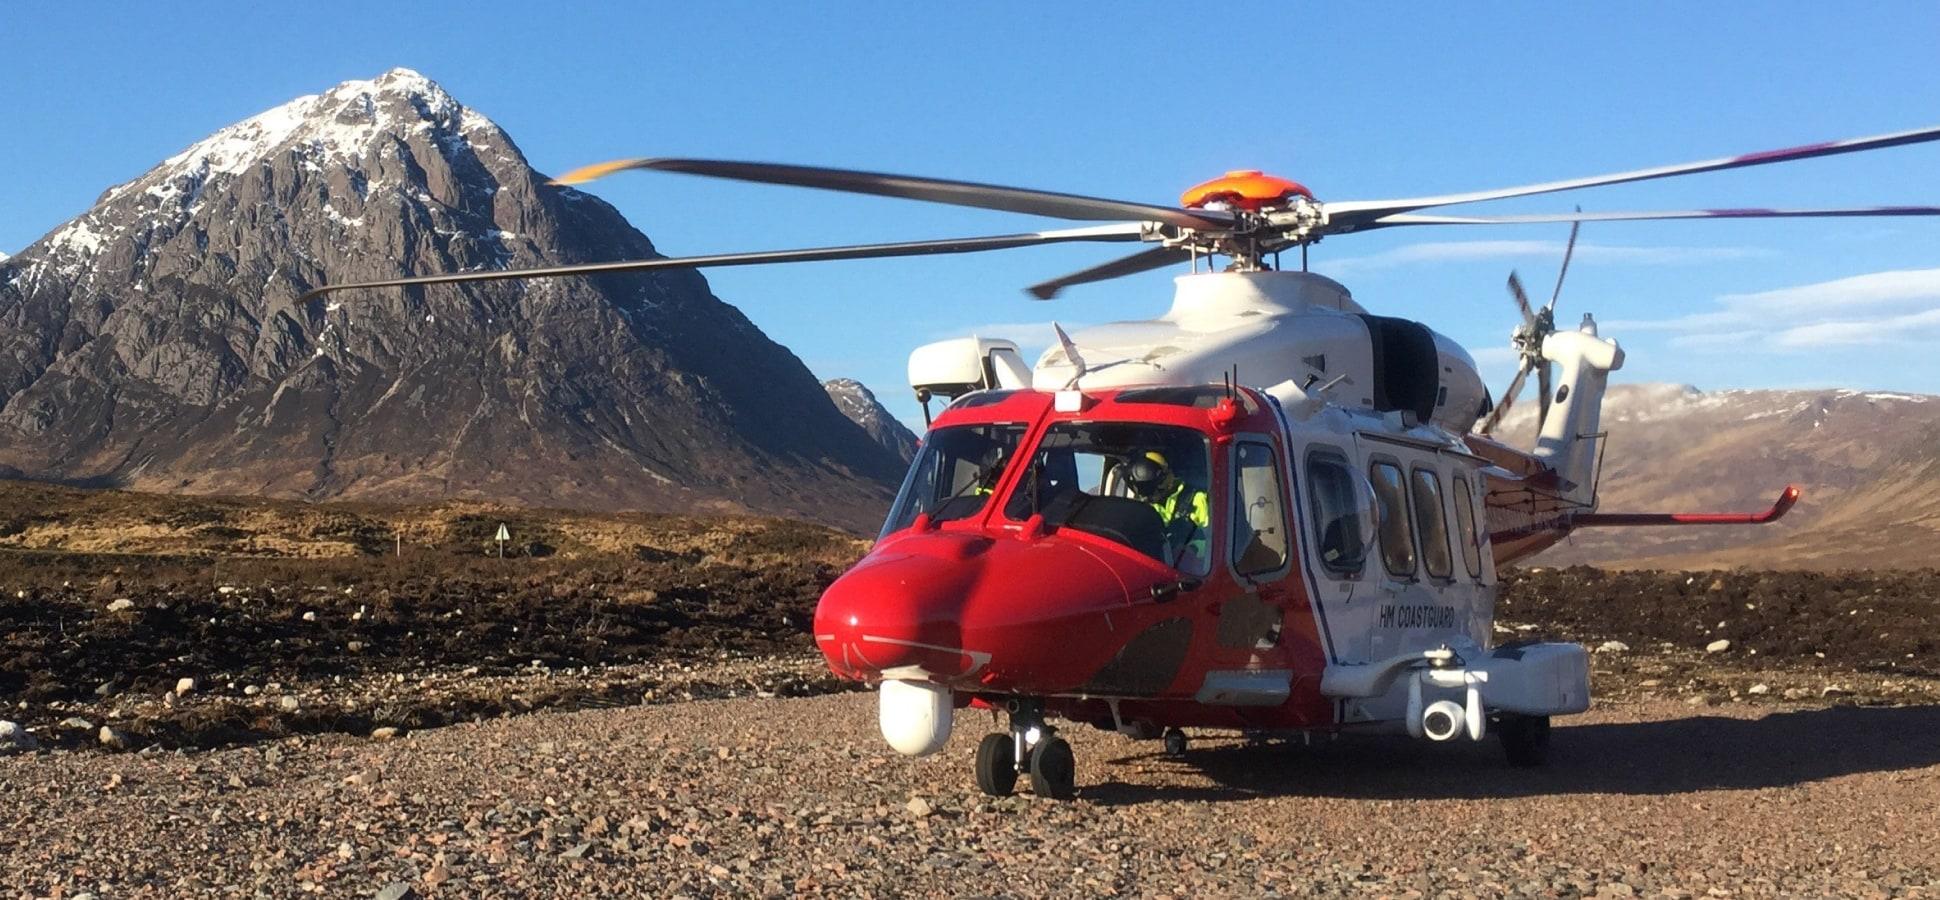 HM Coastguard